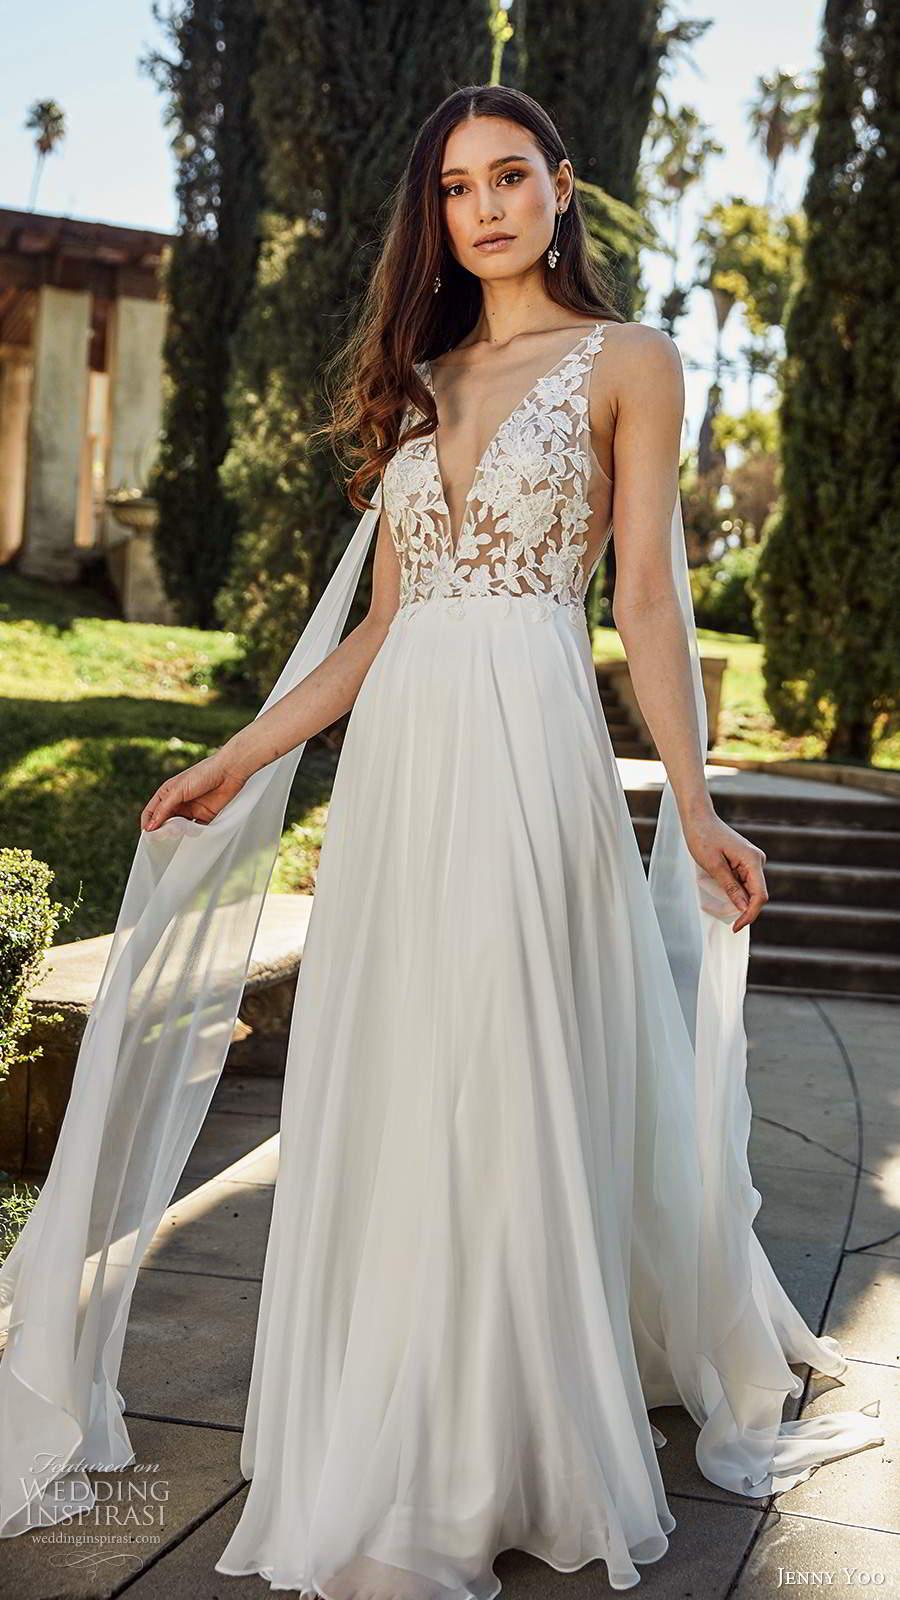 jenny yoo spring 2020 bridal sleeveless straps plunging v necklie embellished bodice clean skirt a line ball gown wedding dress chapel train (4) fv